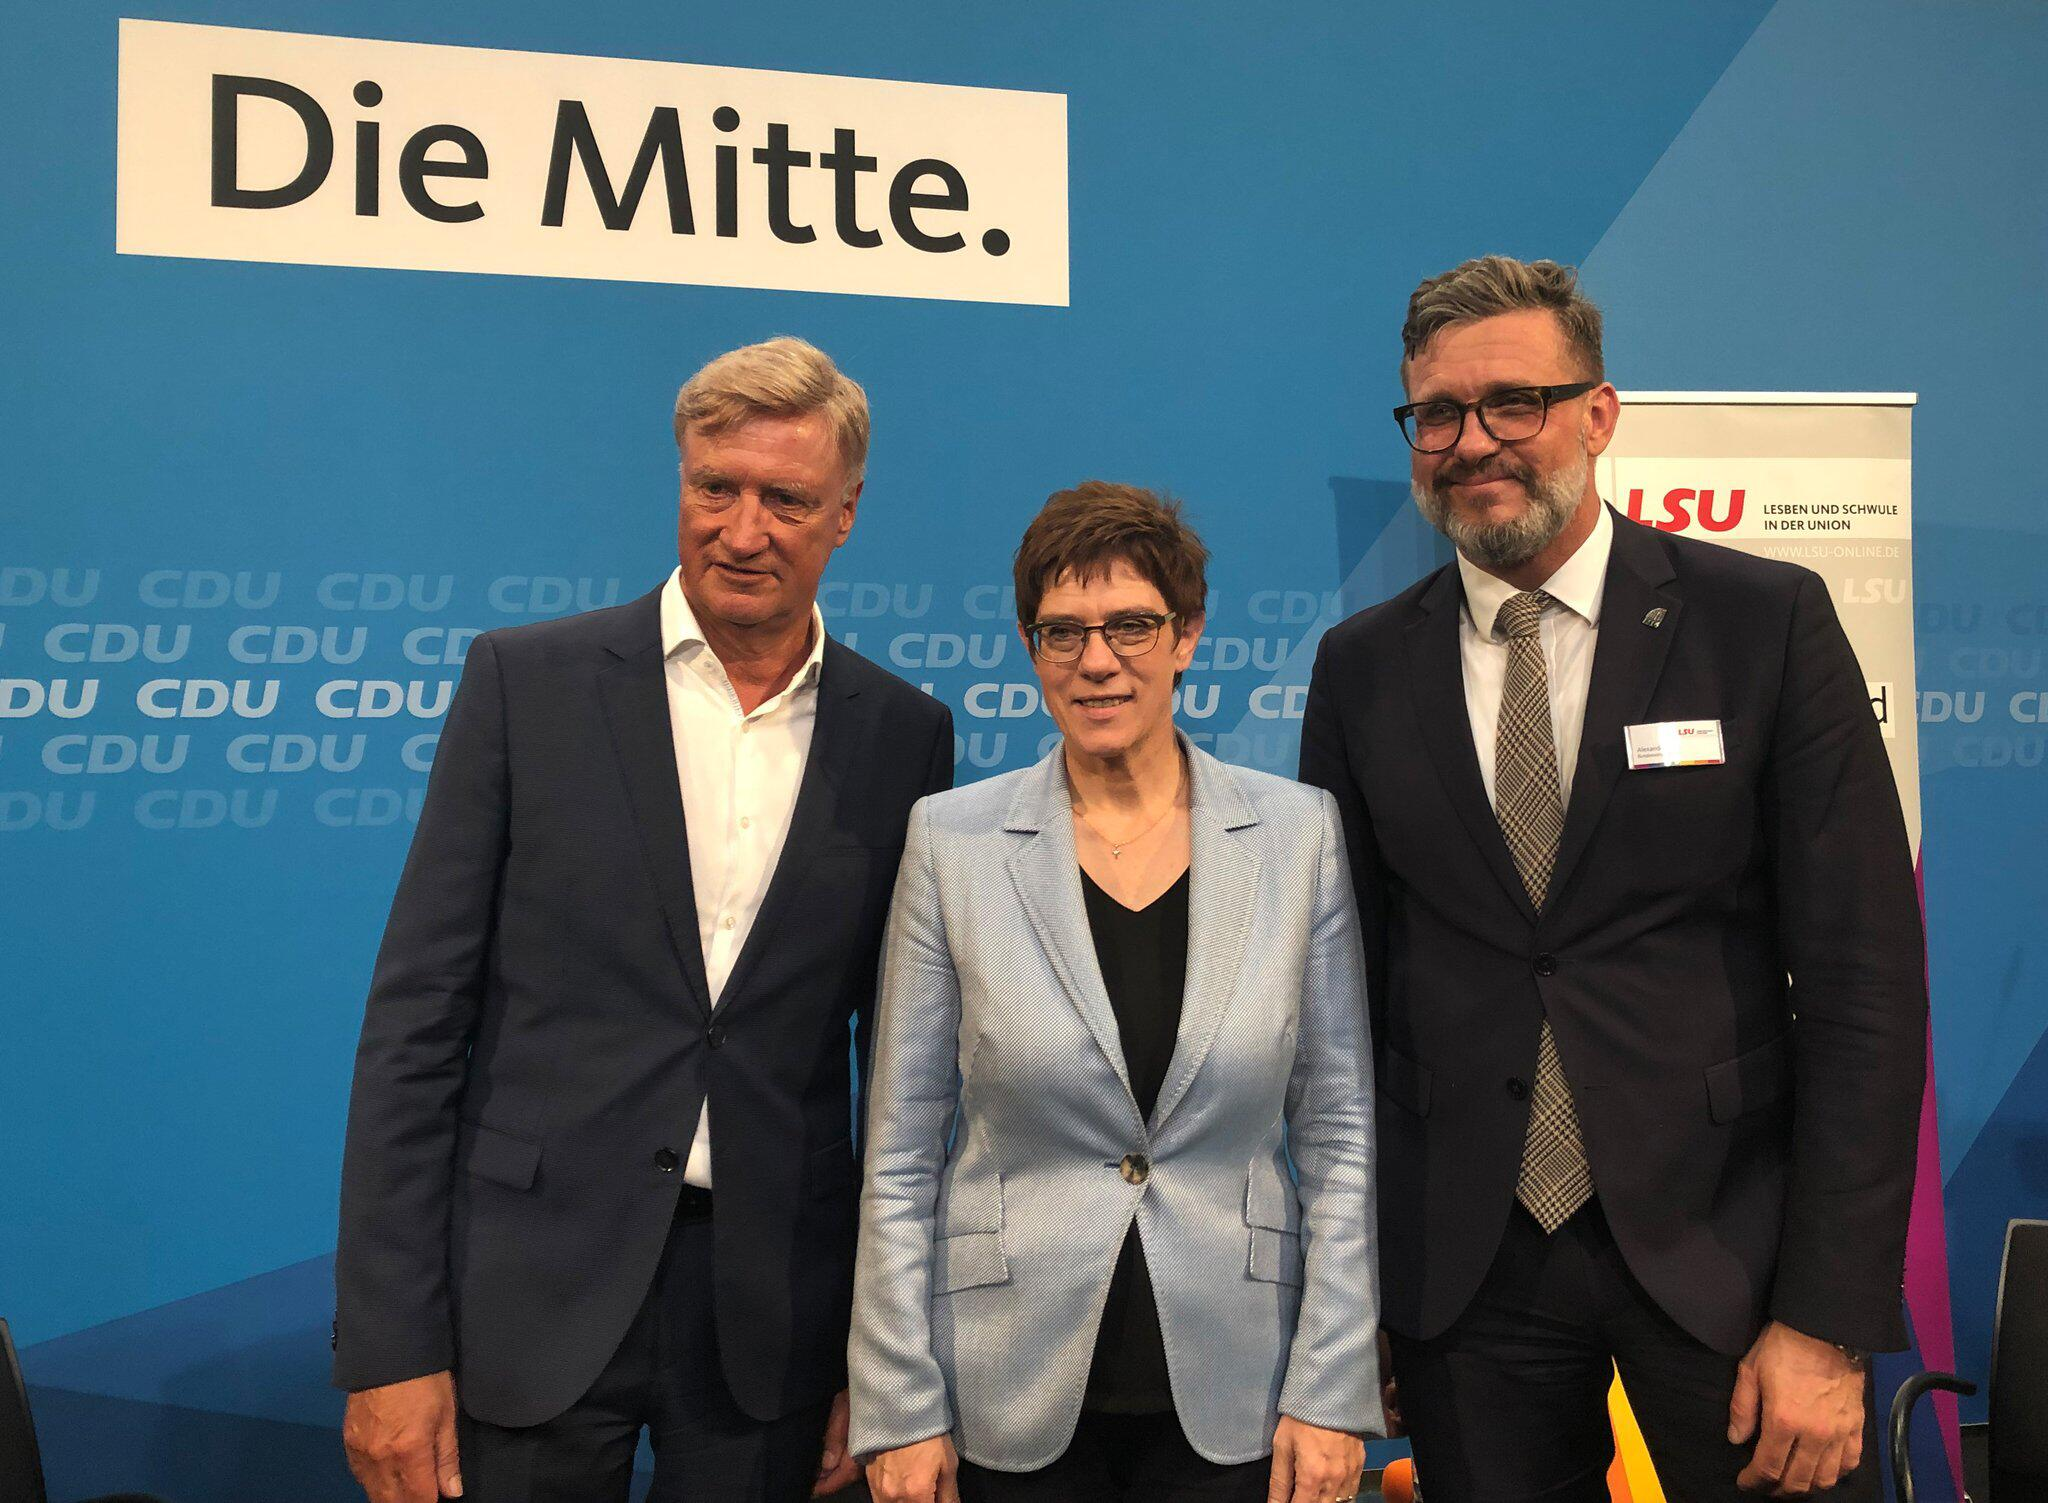 Bild zu Kramp-Karrenbauer confirms commitment to marriage for all